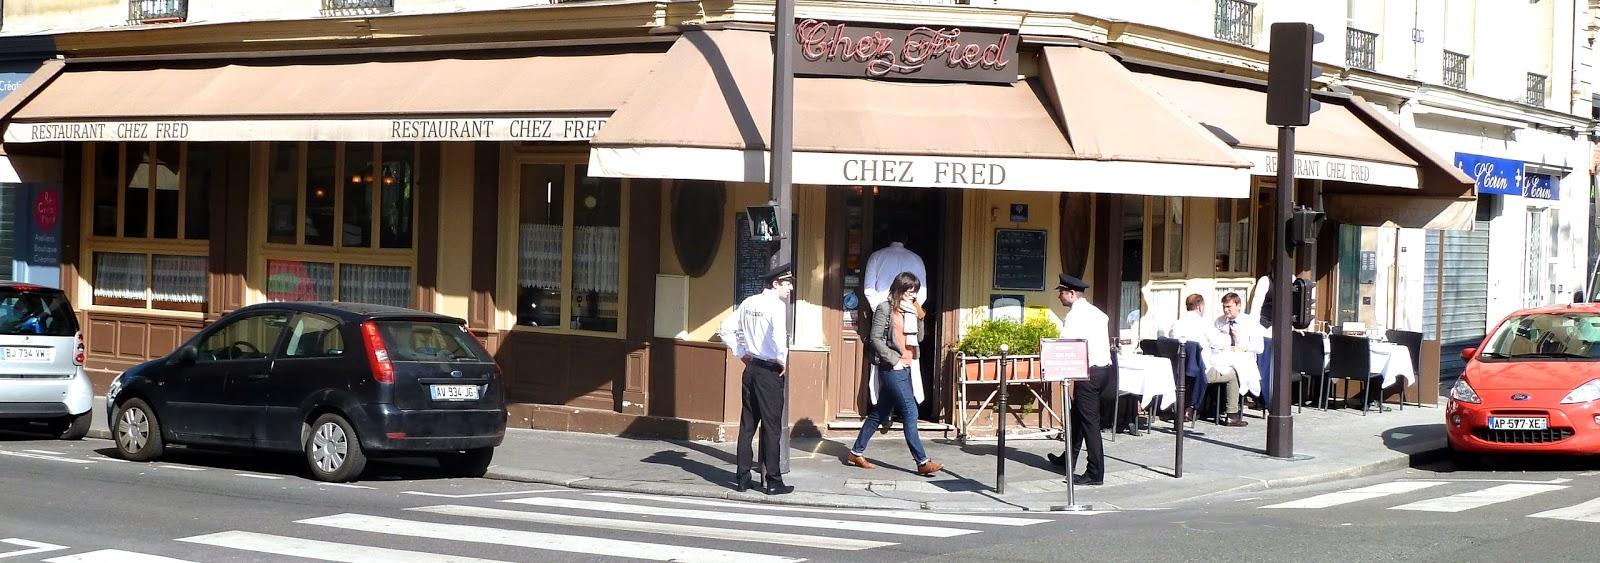 Metro porte maillot or bus pc1 or pc3 tel 01 45 74 20 48 closed sundays website http www bestrestaurantsparis com en restaurant paris chez fred html